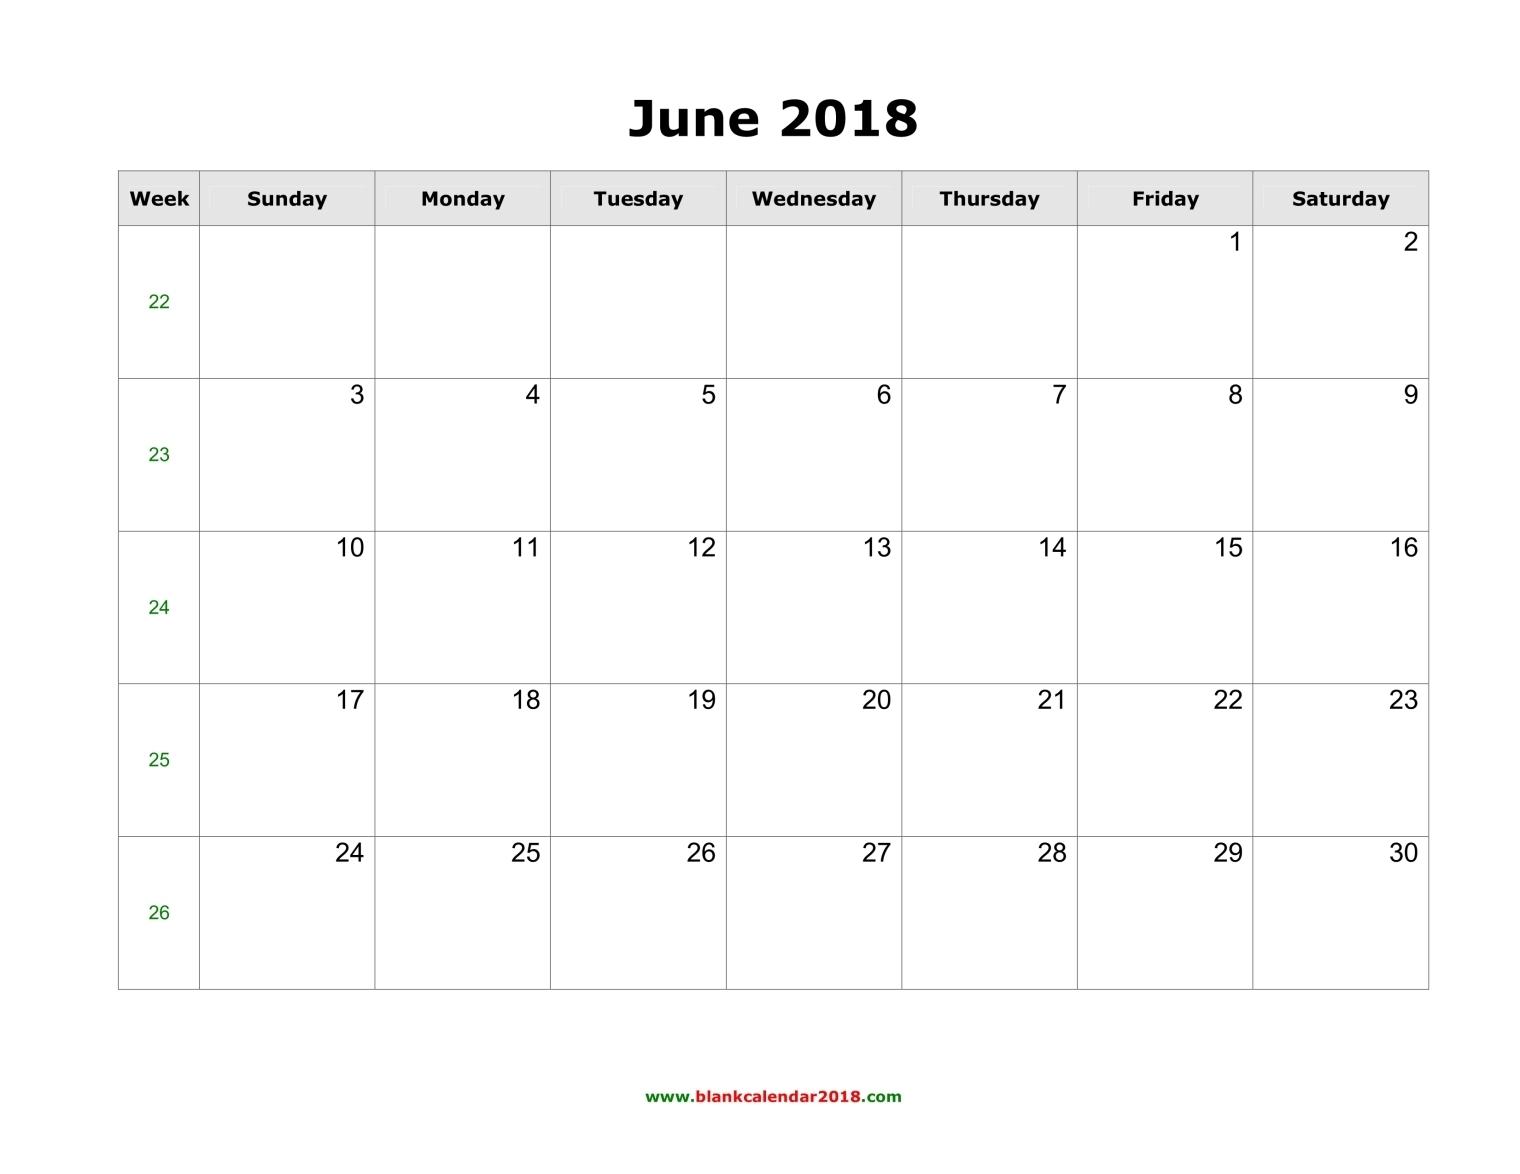 Blank Calendar For June 2018 throughout Blank Calendar June July